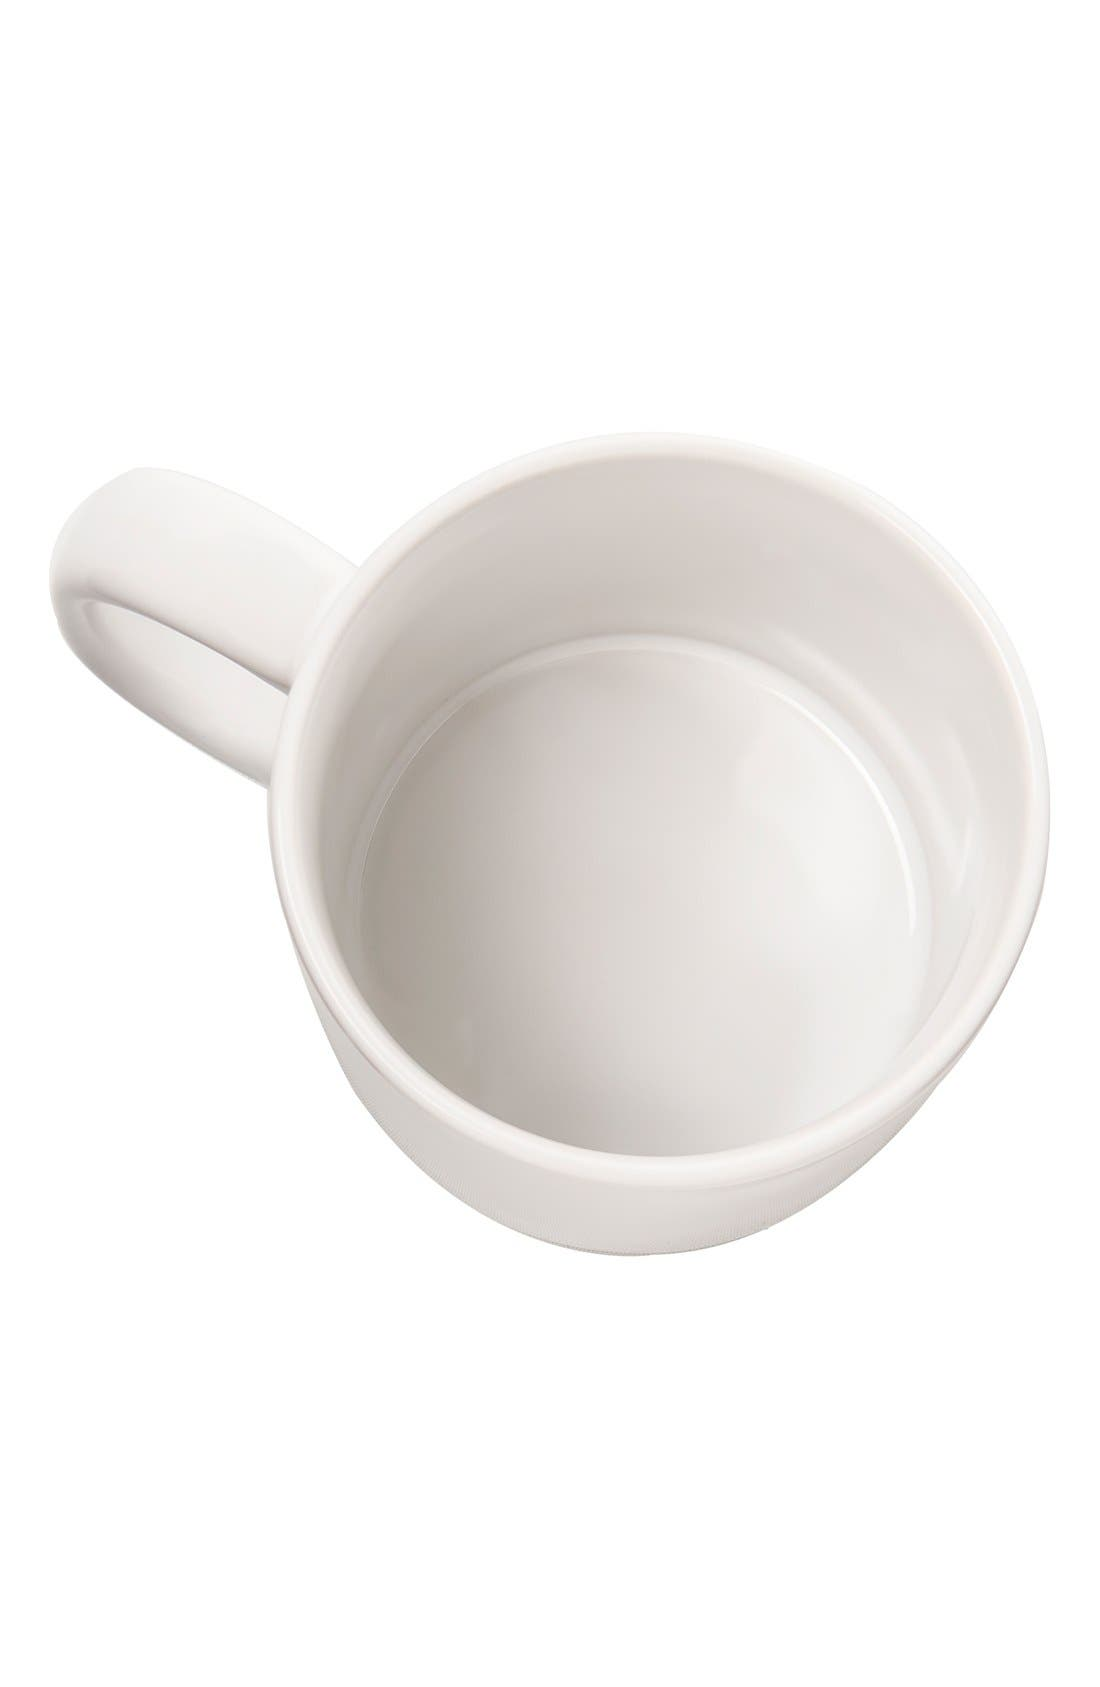 'Bacon & Eggs' Ceramic Coffee Mugs,                             Alternate thumbnail 4, color,                             100